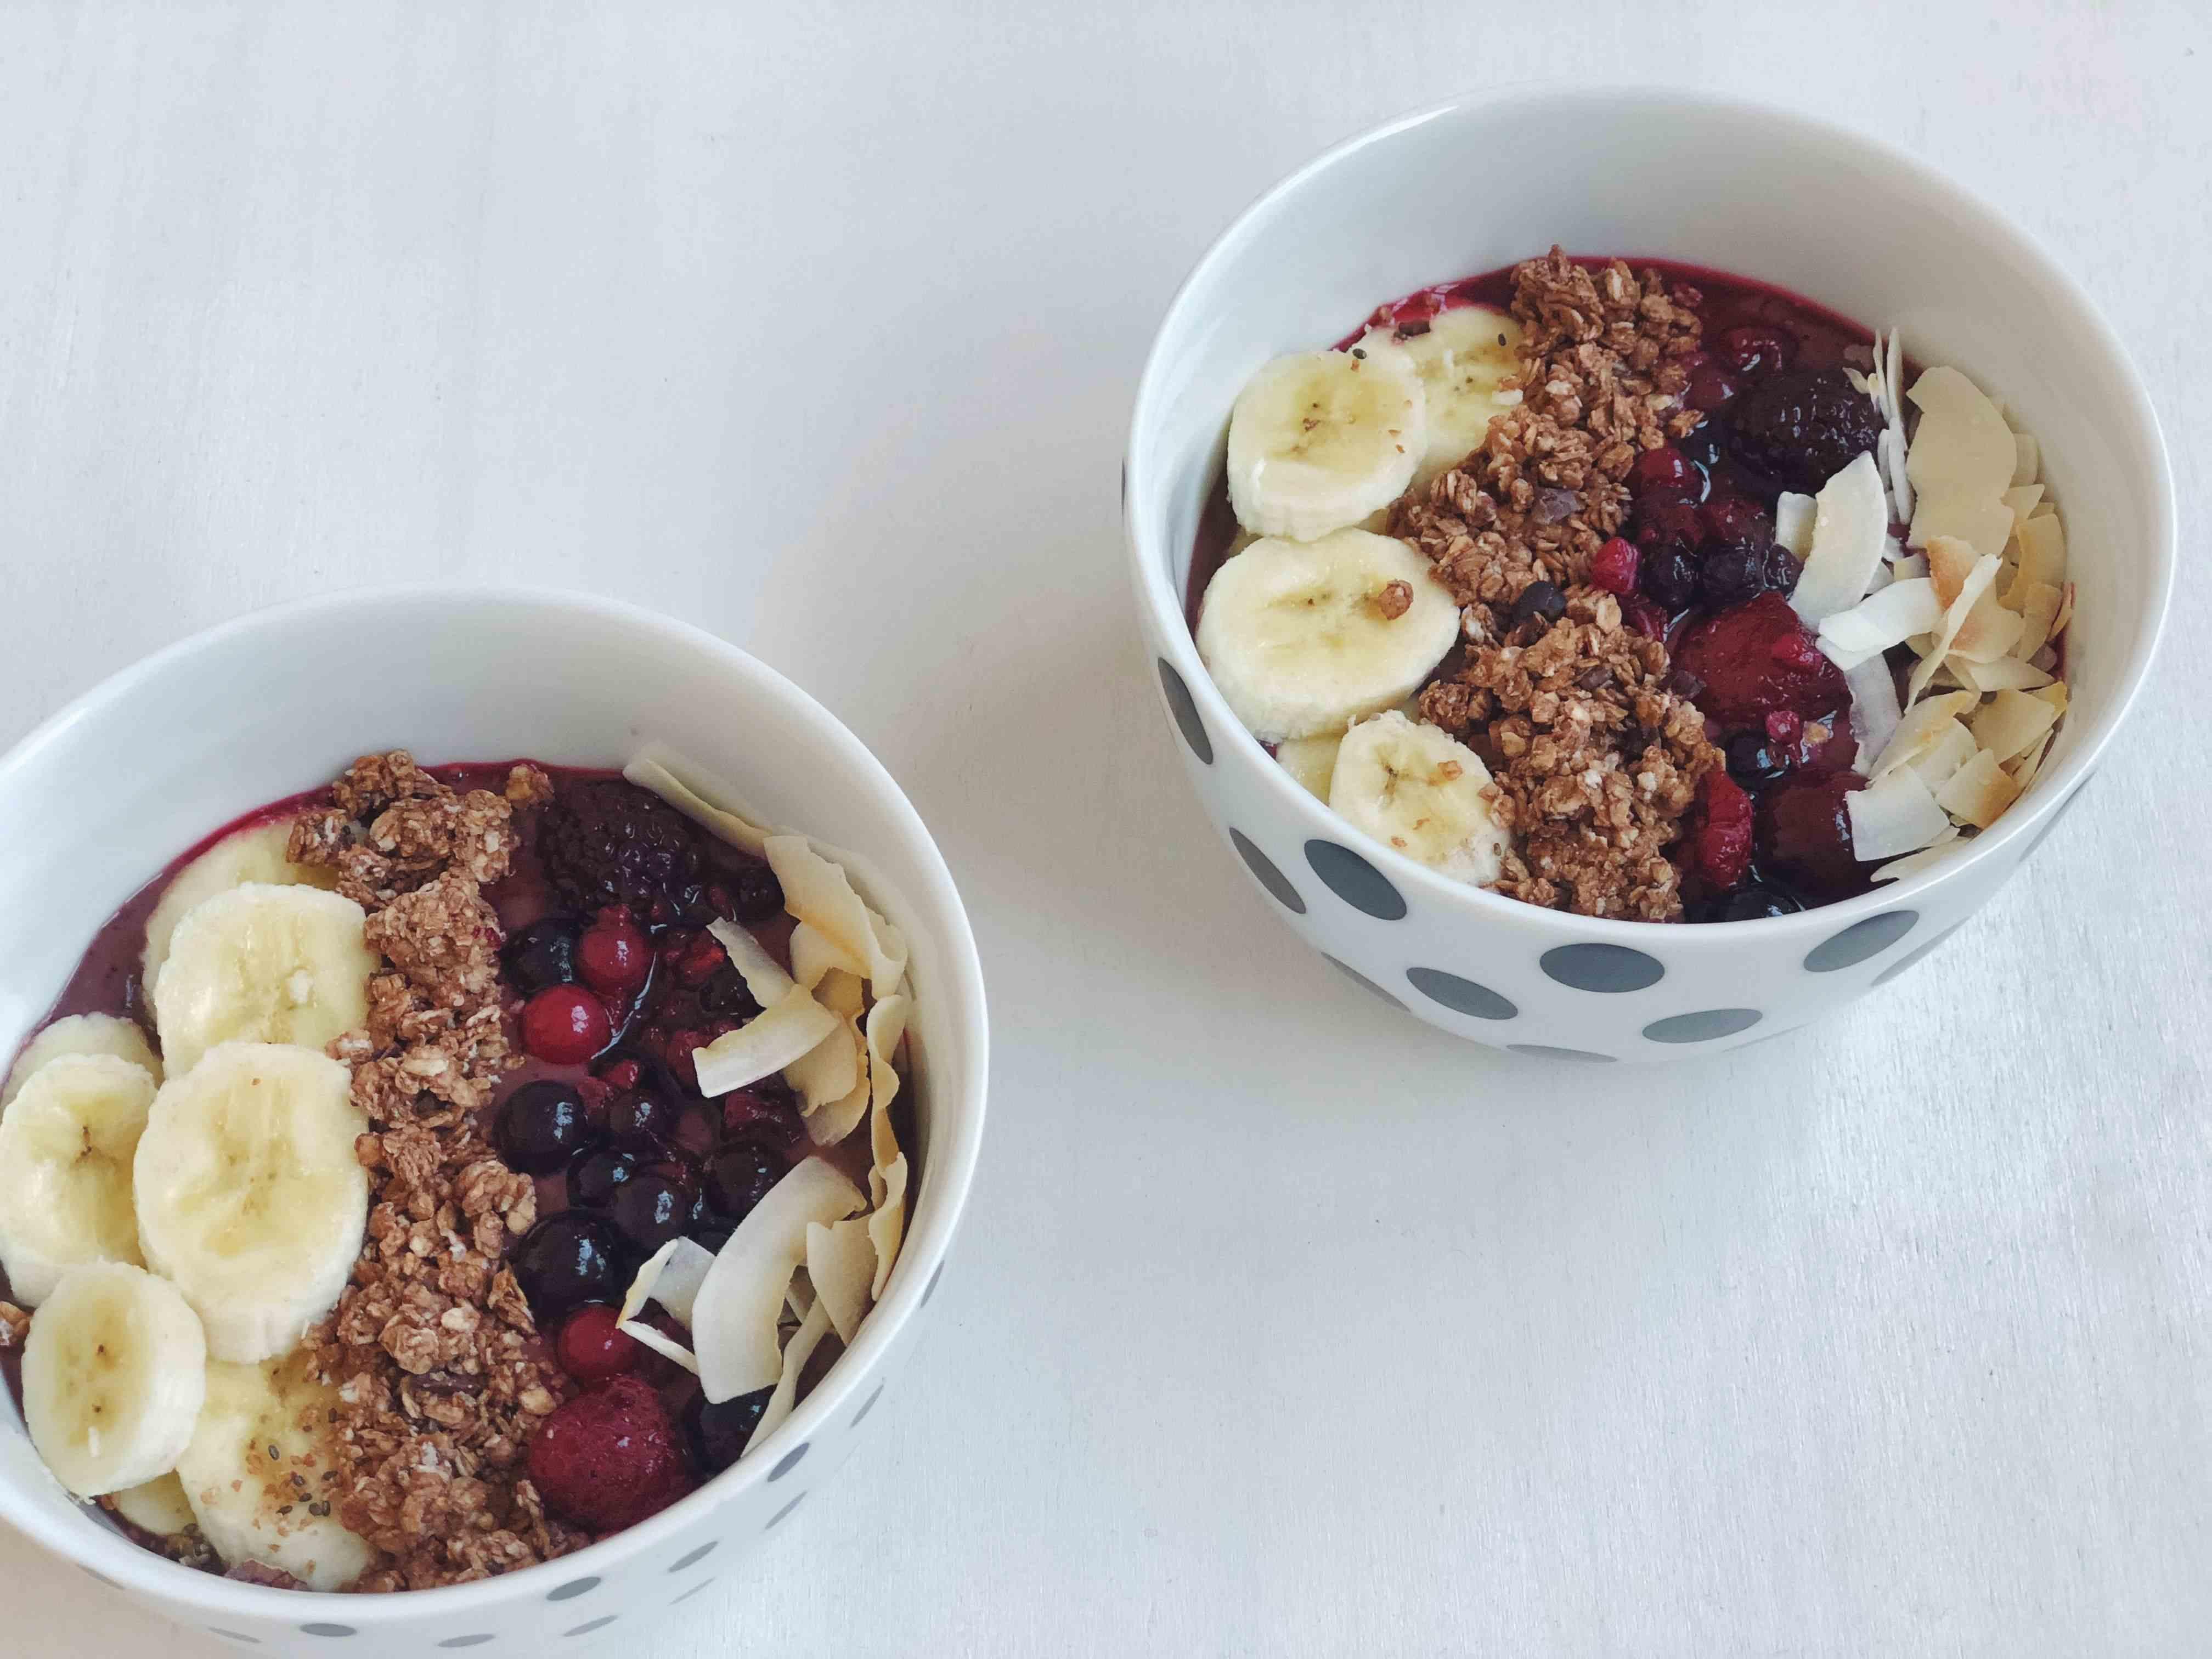 Rezept-Heidelbeer-Bowl-Superfruit-Gesund-Ernährung-Frühstück-Regional